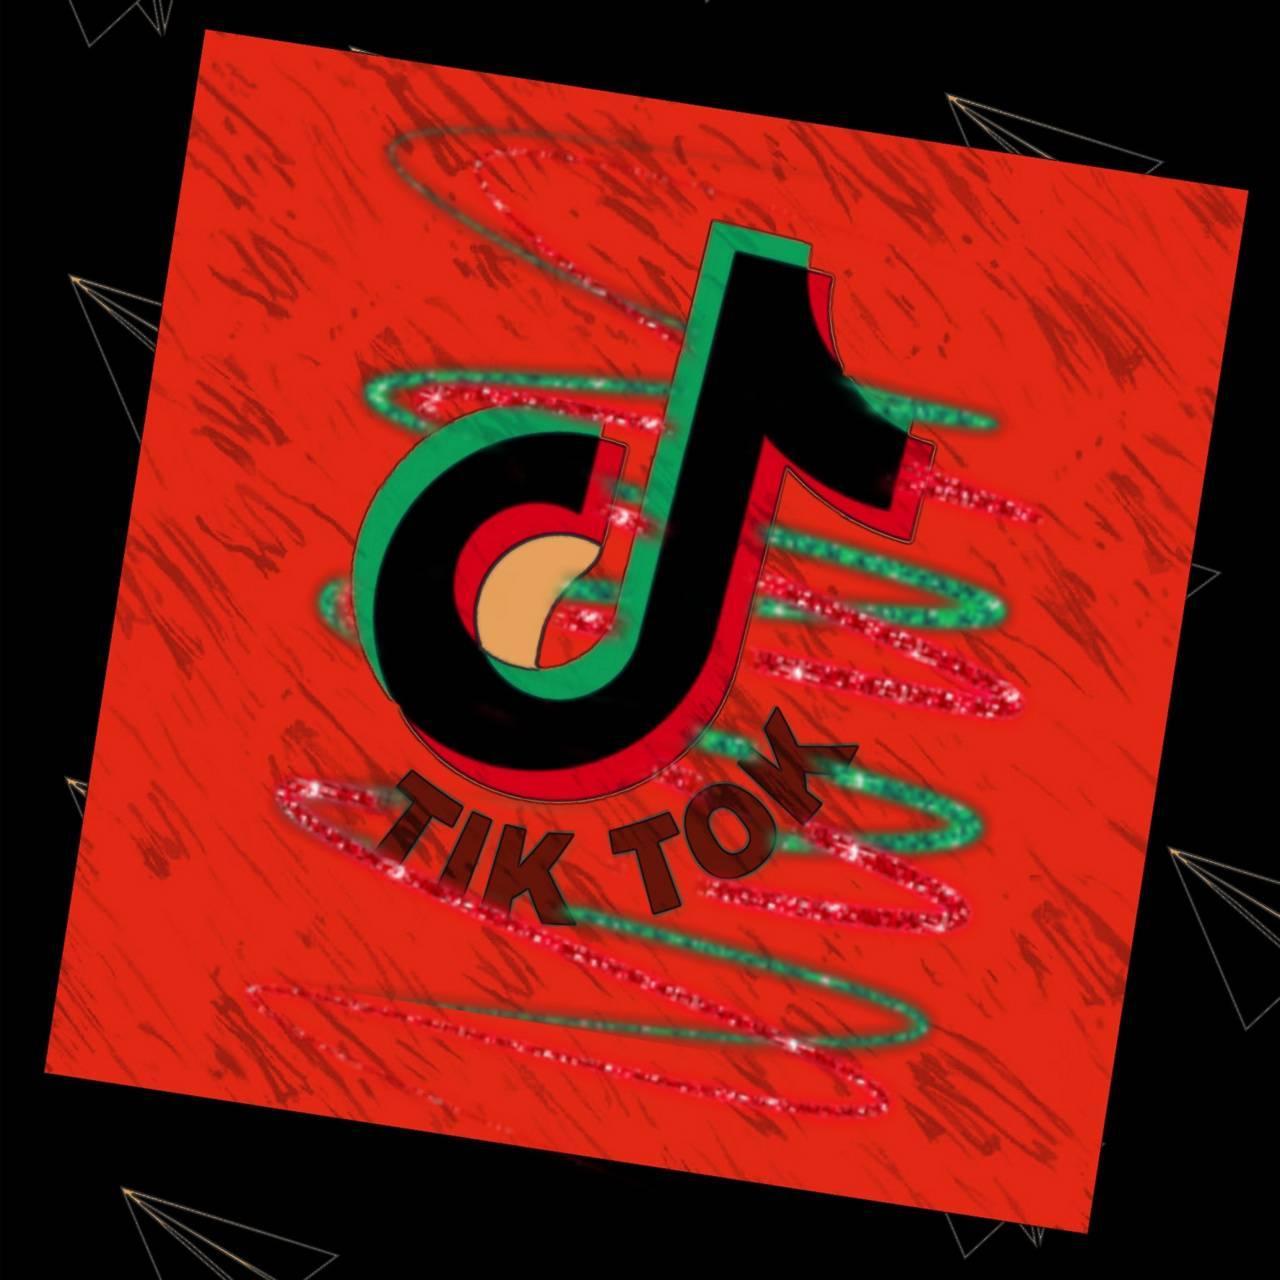 Tik Tok Logo Wallpapers Wallpaper Cave